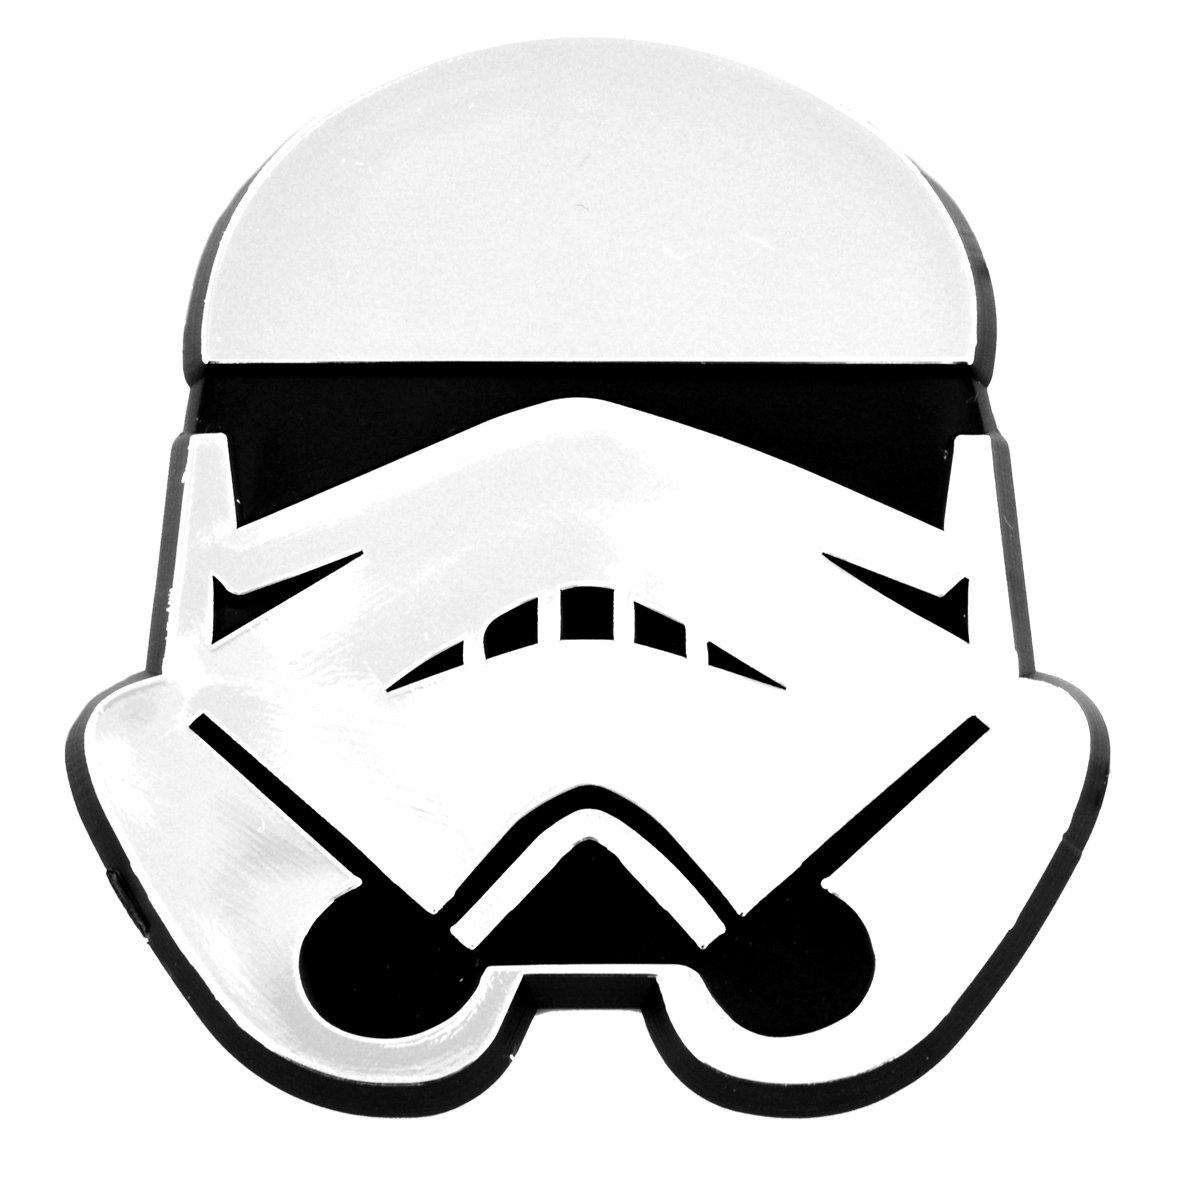 Stormtrooper Helmet Chrome Auto Emblem.